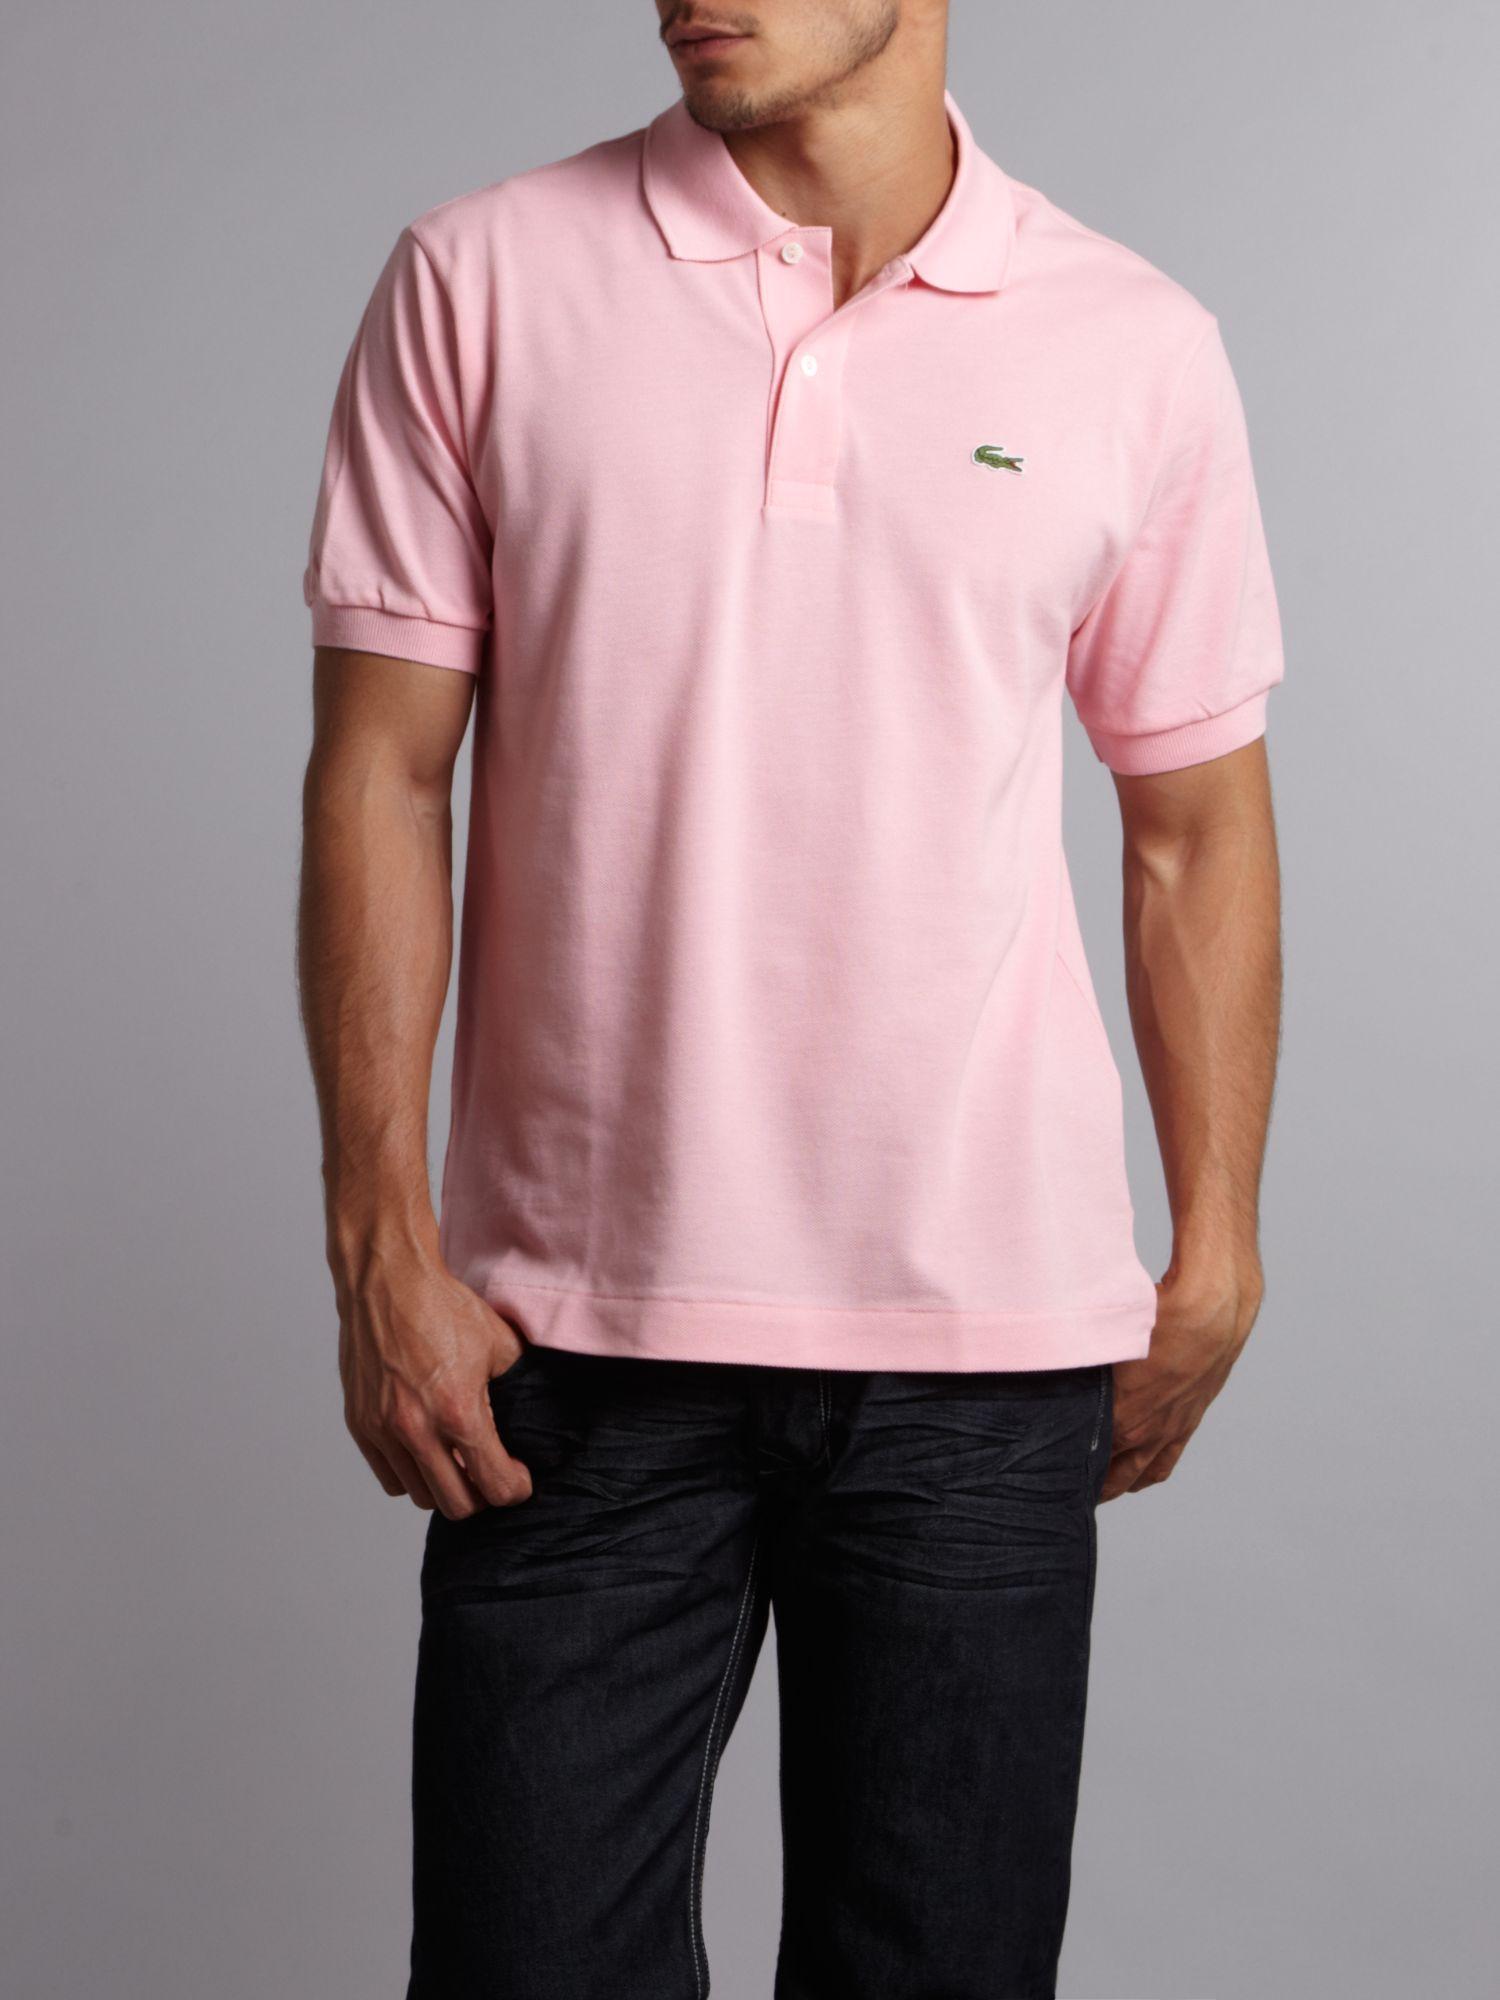 75465424f Lacoste Polo Shirts Mens